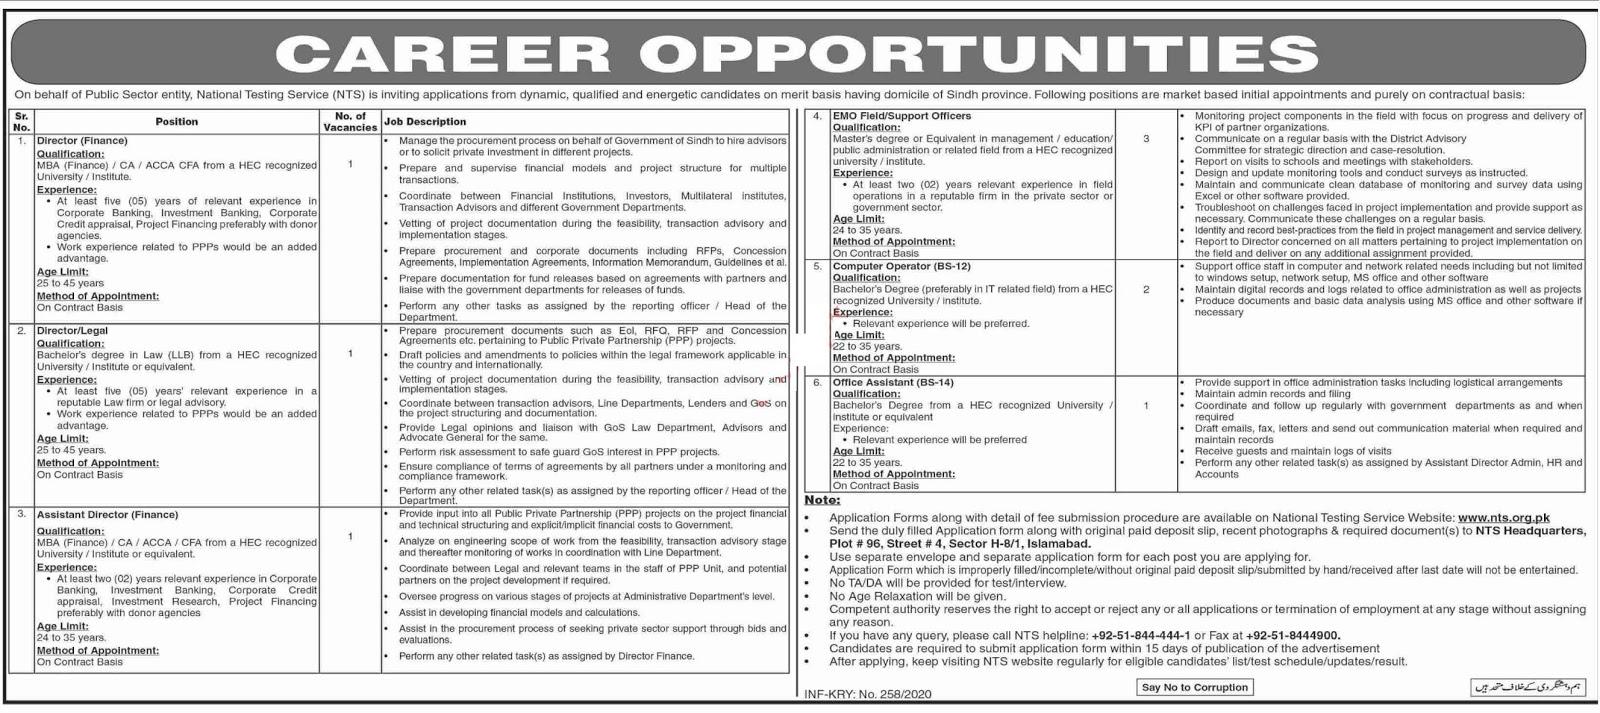 Public Sector Entity Jobs 2020 Via NTS Testing Service